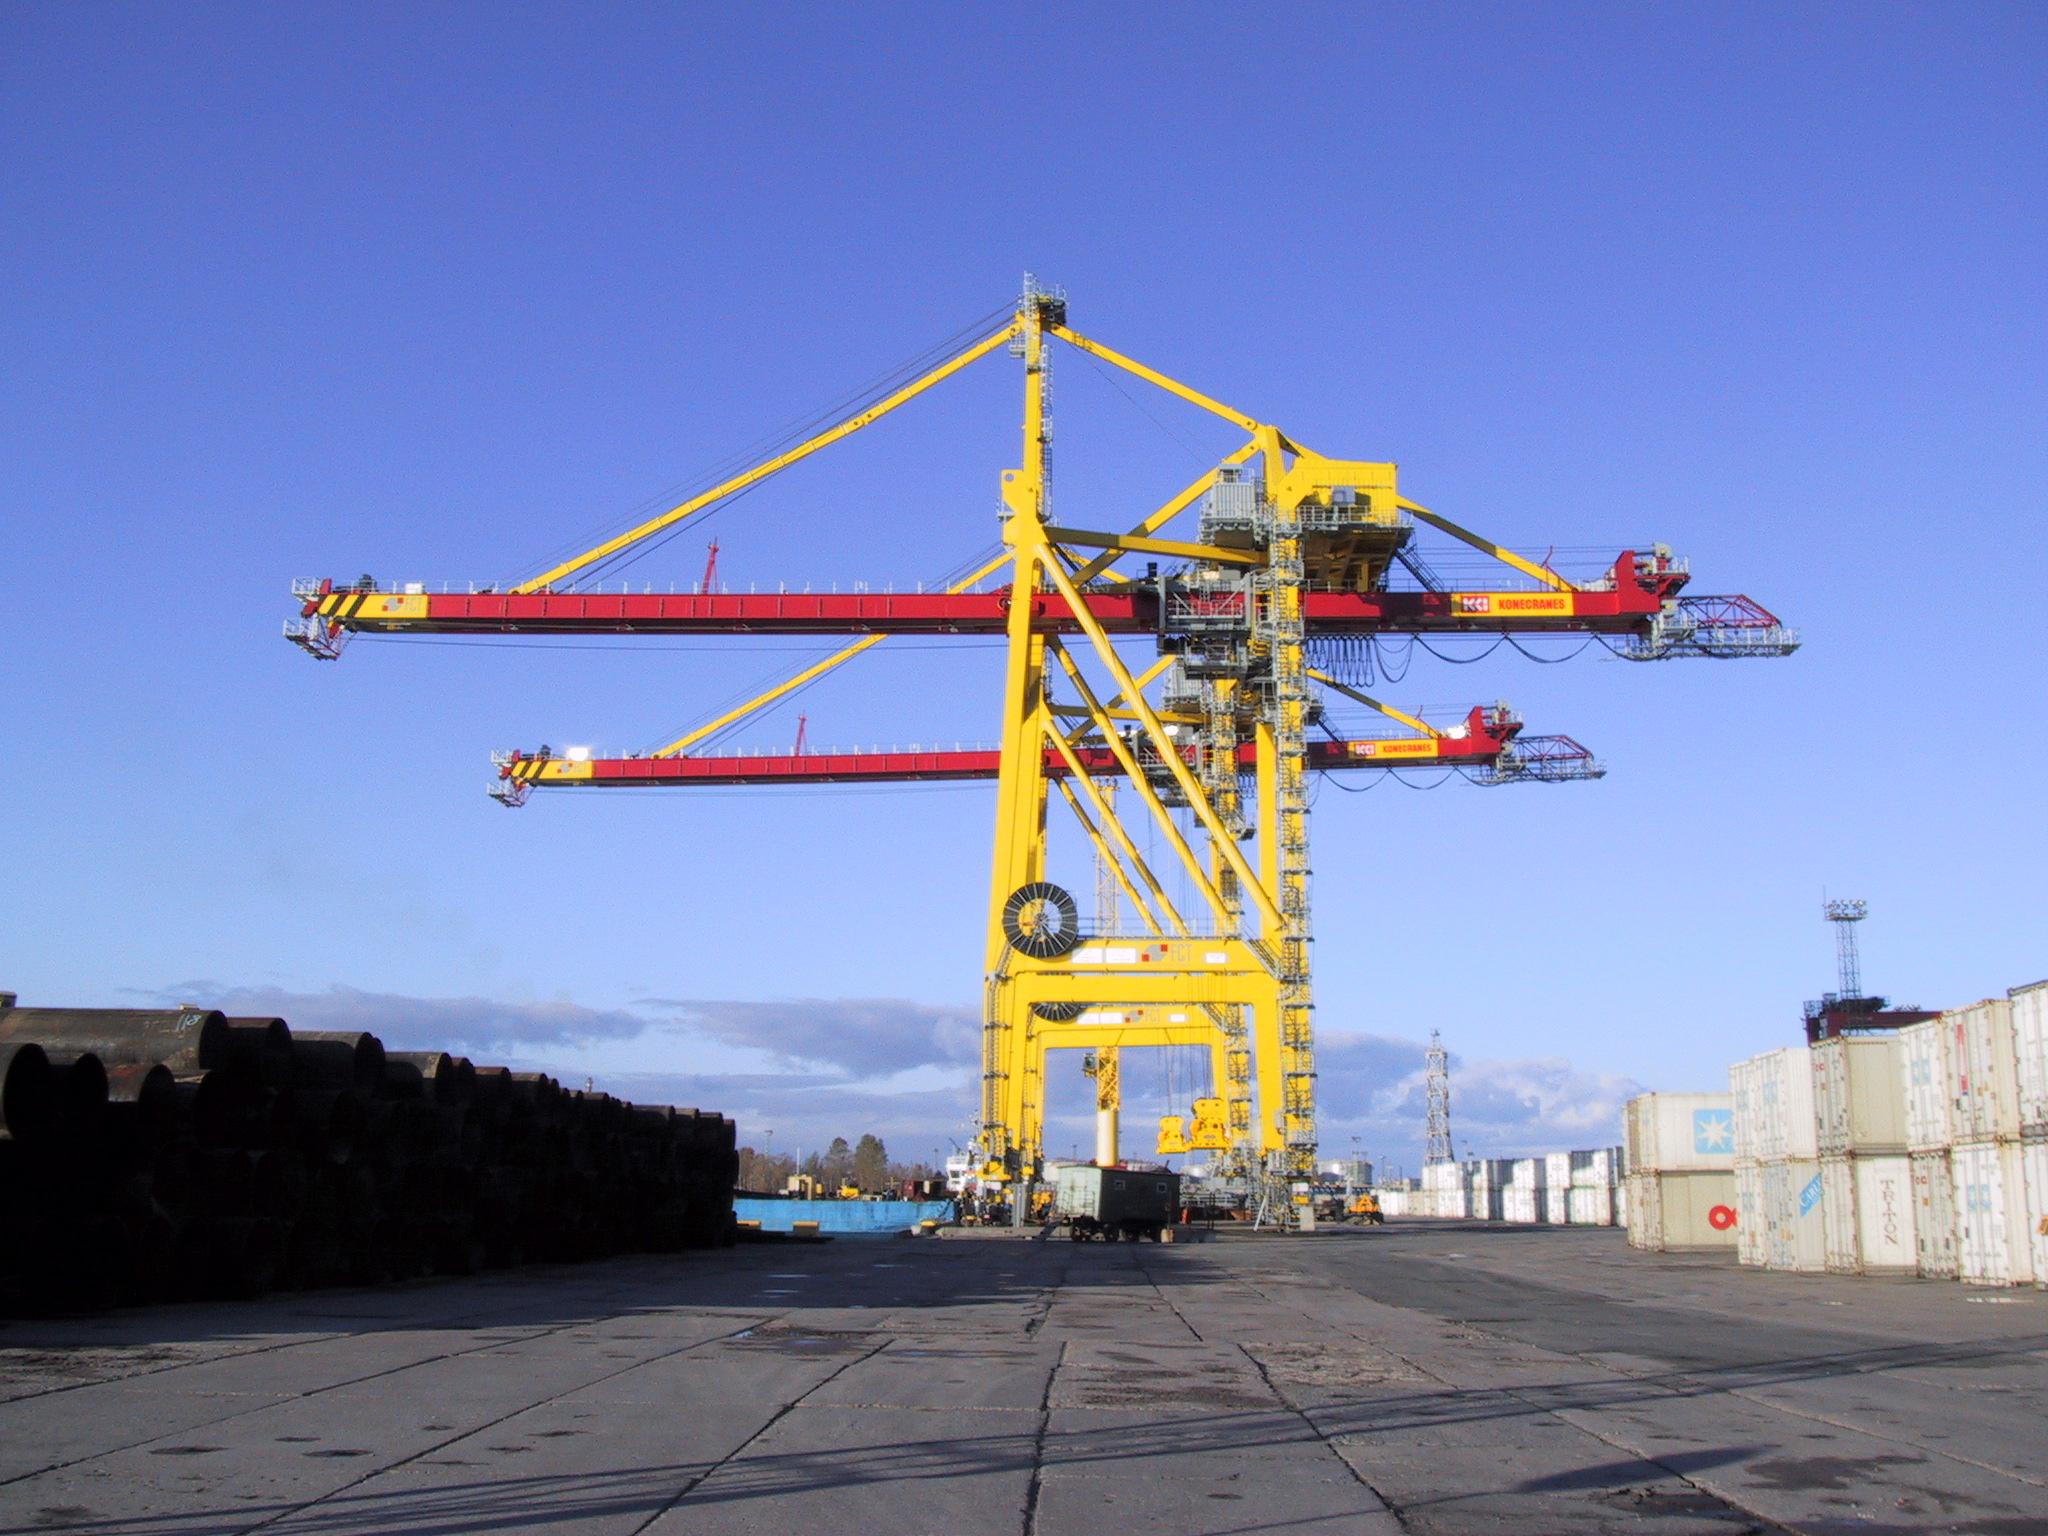 Konecranes Supplies Rtg Cranes To Brazil And Spain